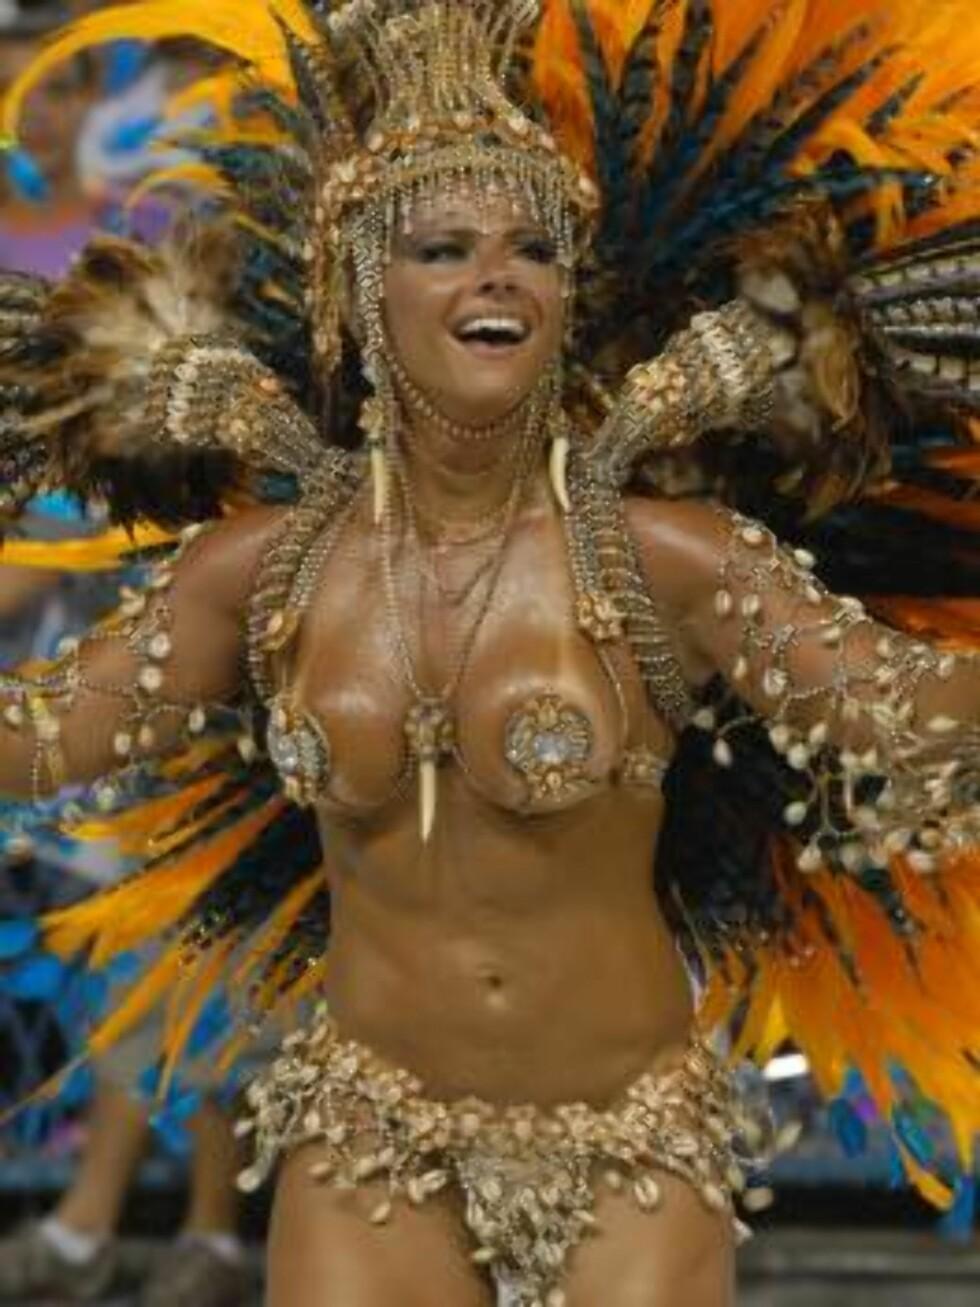 20070218: RIO DE JANEIRO, BRAZIL: Carnival Parades 2007 in Rio de Janeiro Sambodromo. PIctured here Unidos de Vila Isabel Samba School.PHOTO: BRAINPIX Code: 4027  COPYRIGHT STELLA  PICTURES Foto: Stella Pictures